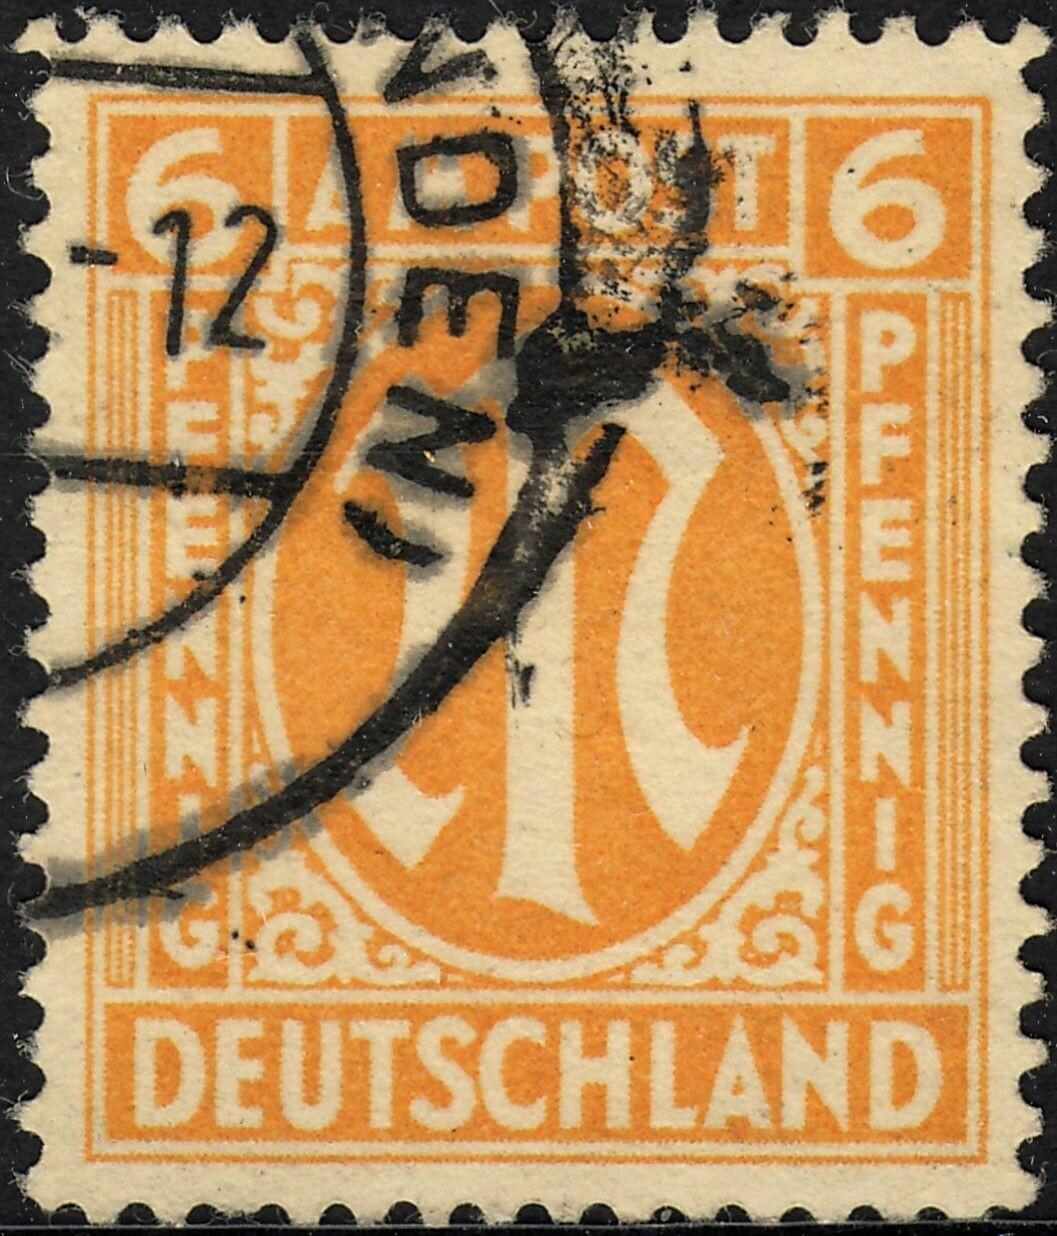 Germany (British/American Zone) 1945 6pf Yellow-Orange Used